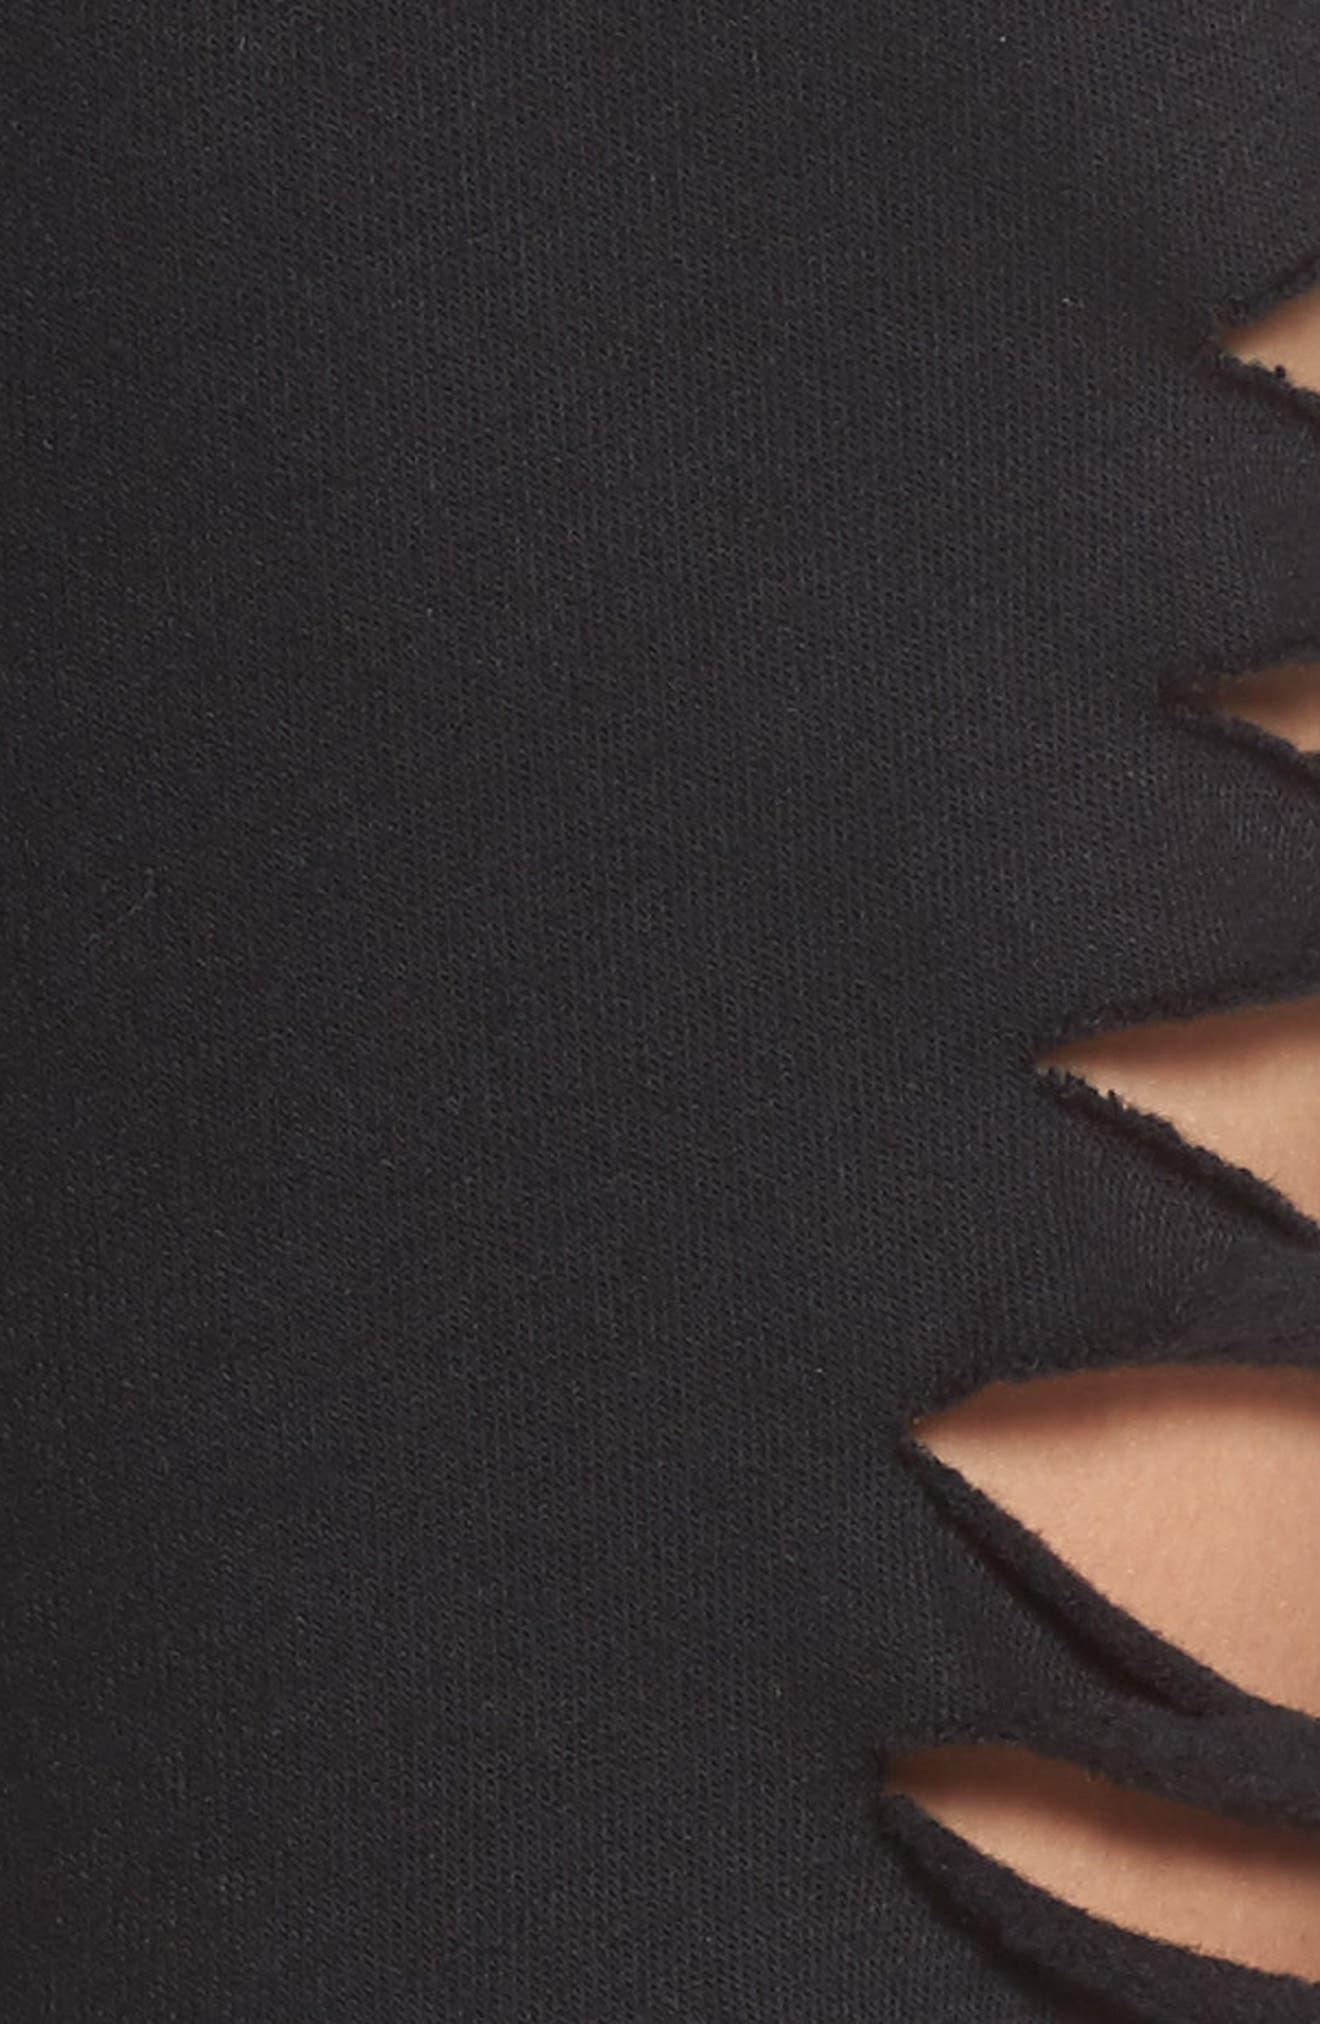 Slay Shorts,                             Alternate thumbnail 6, color,                             Black